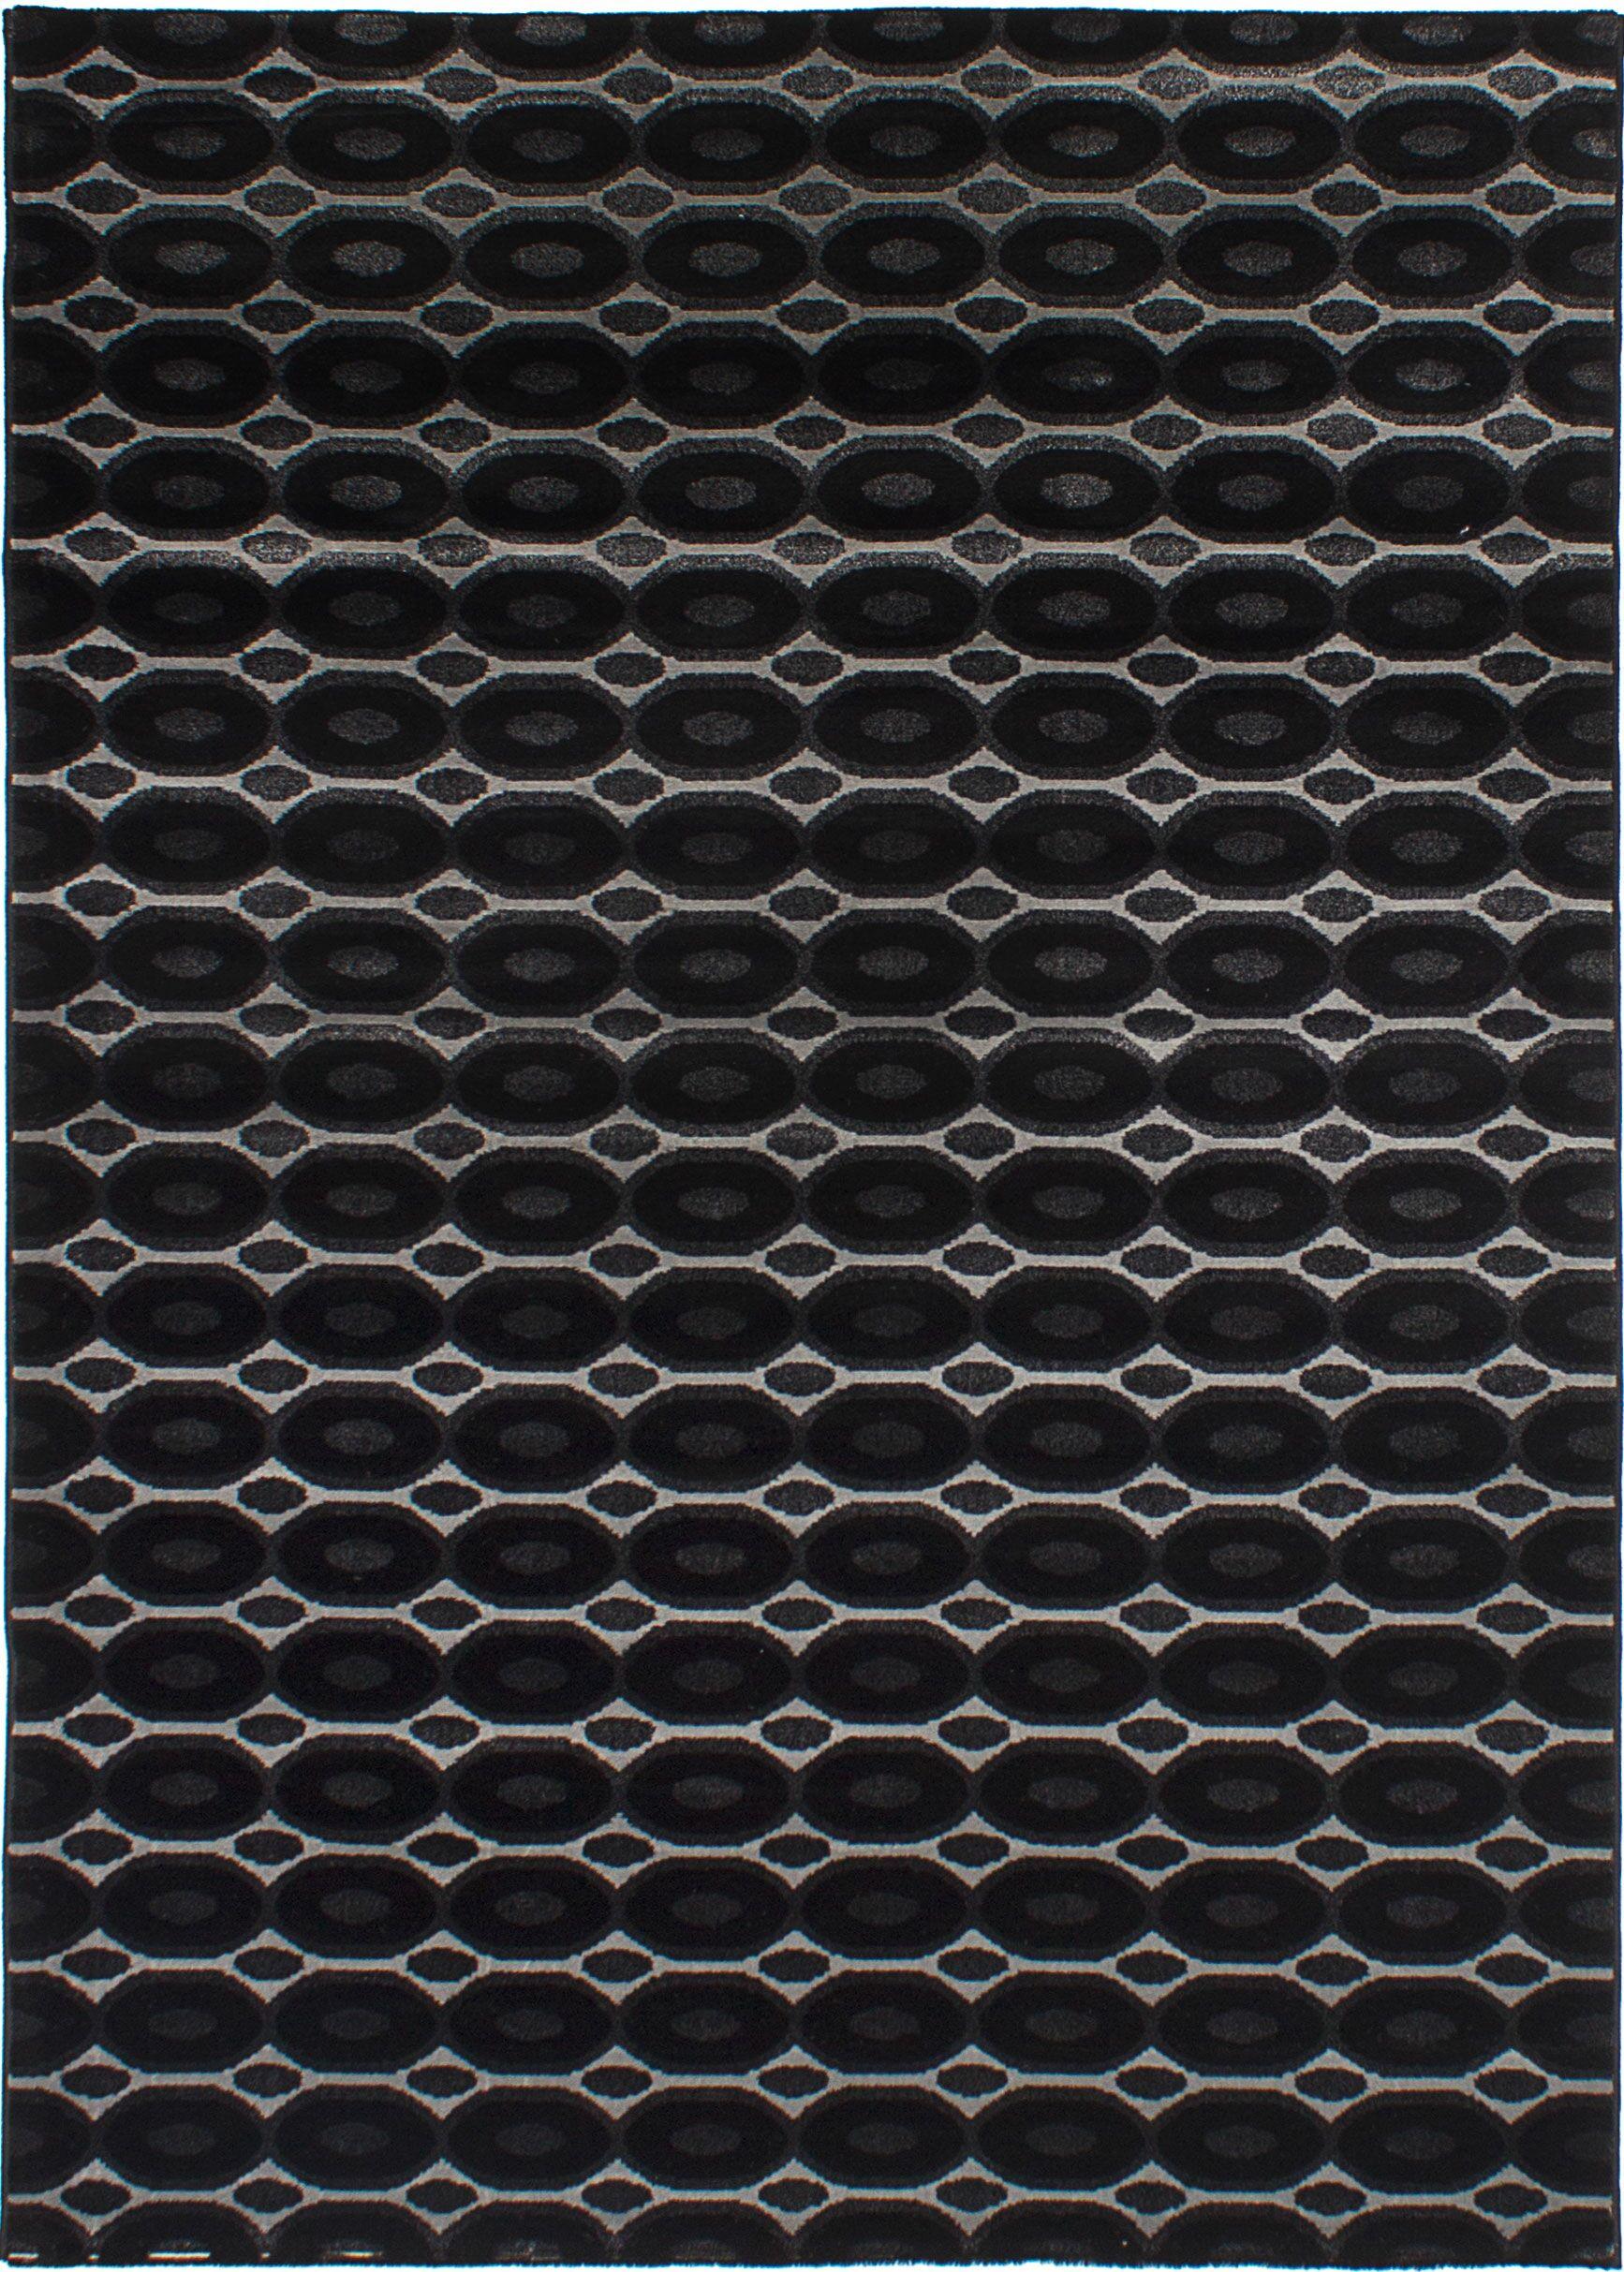 Griffie Black/Light Gray Area Rug